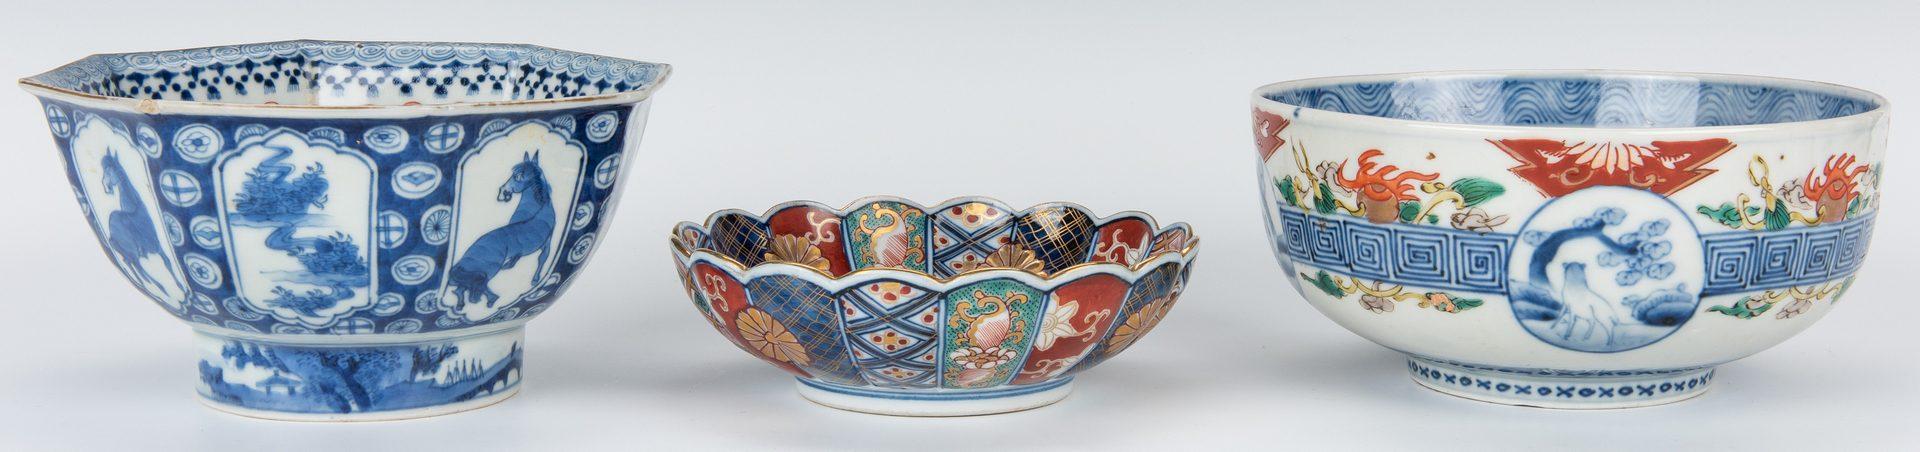 Lot 198: 6 Asian Porcelain Bowls & Plates, inc. Imari